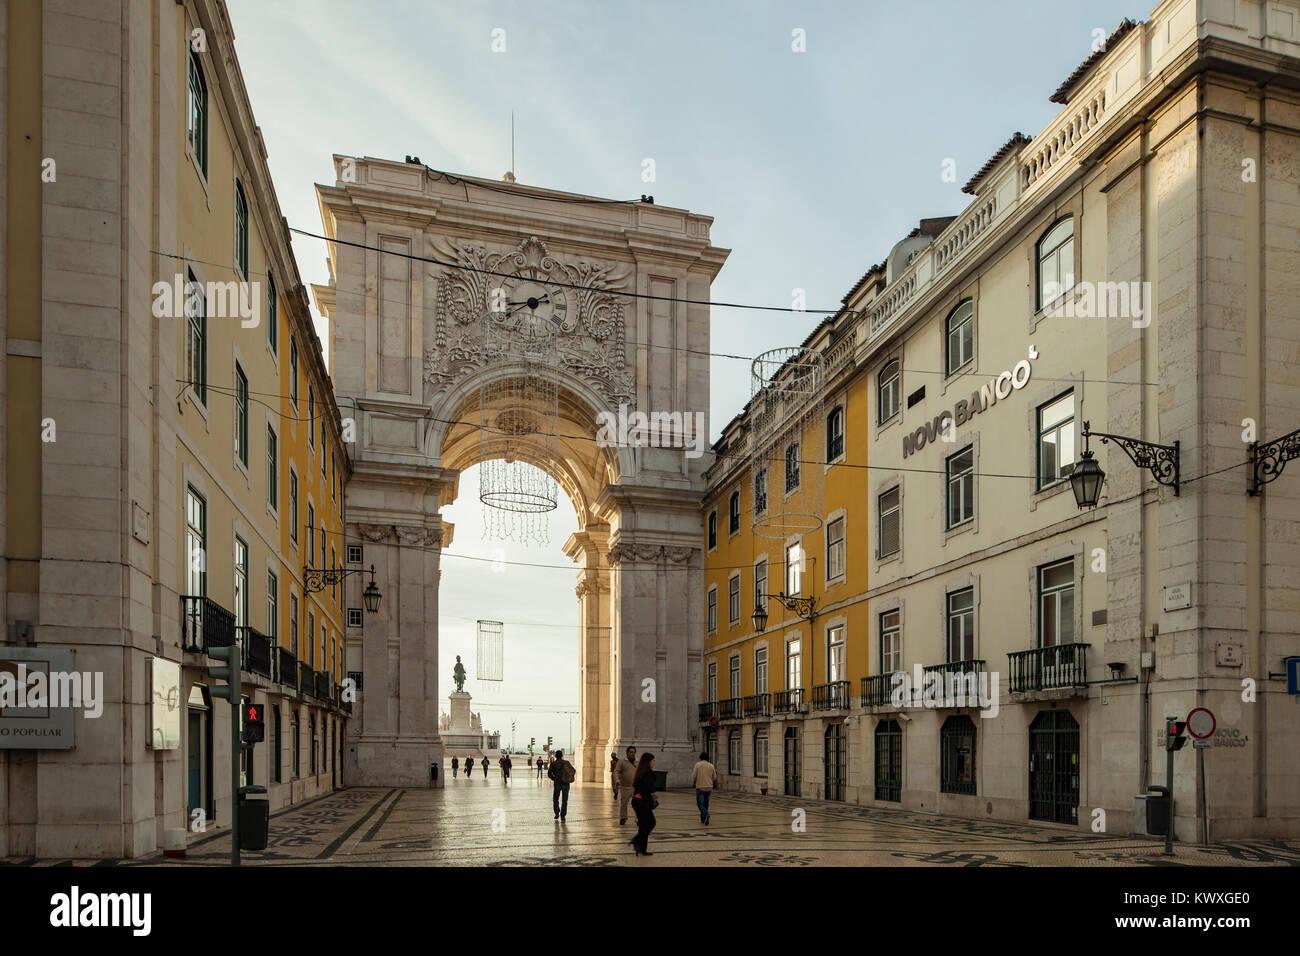 Rua Augusta arch in Lisbon, Portugal. - Stock Image